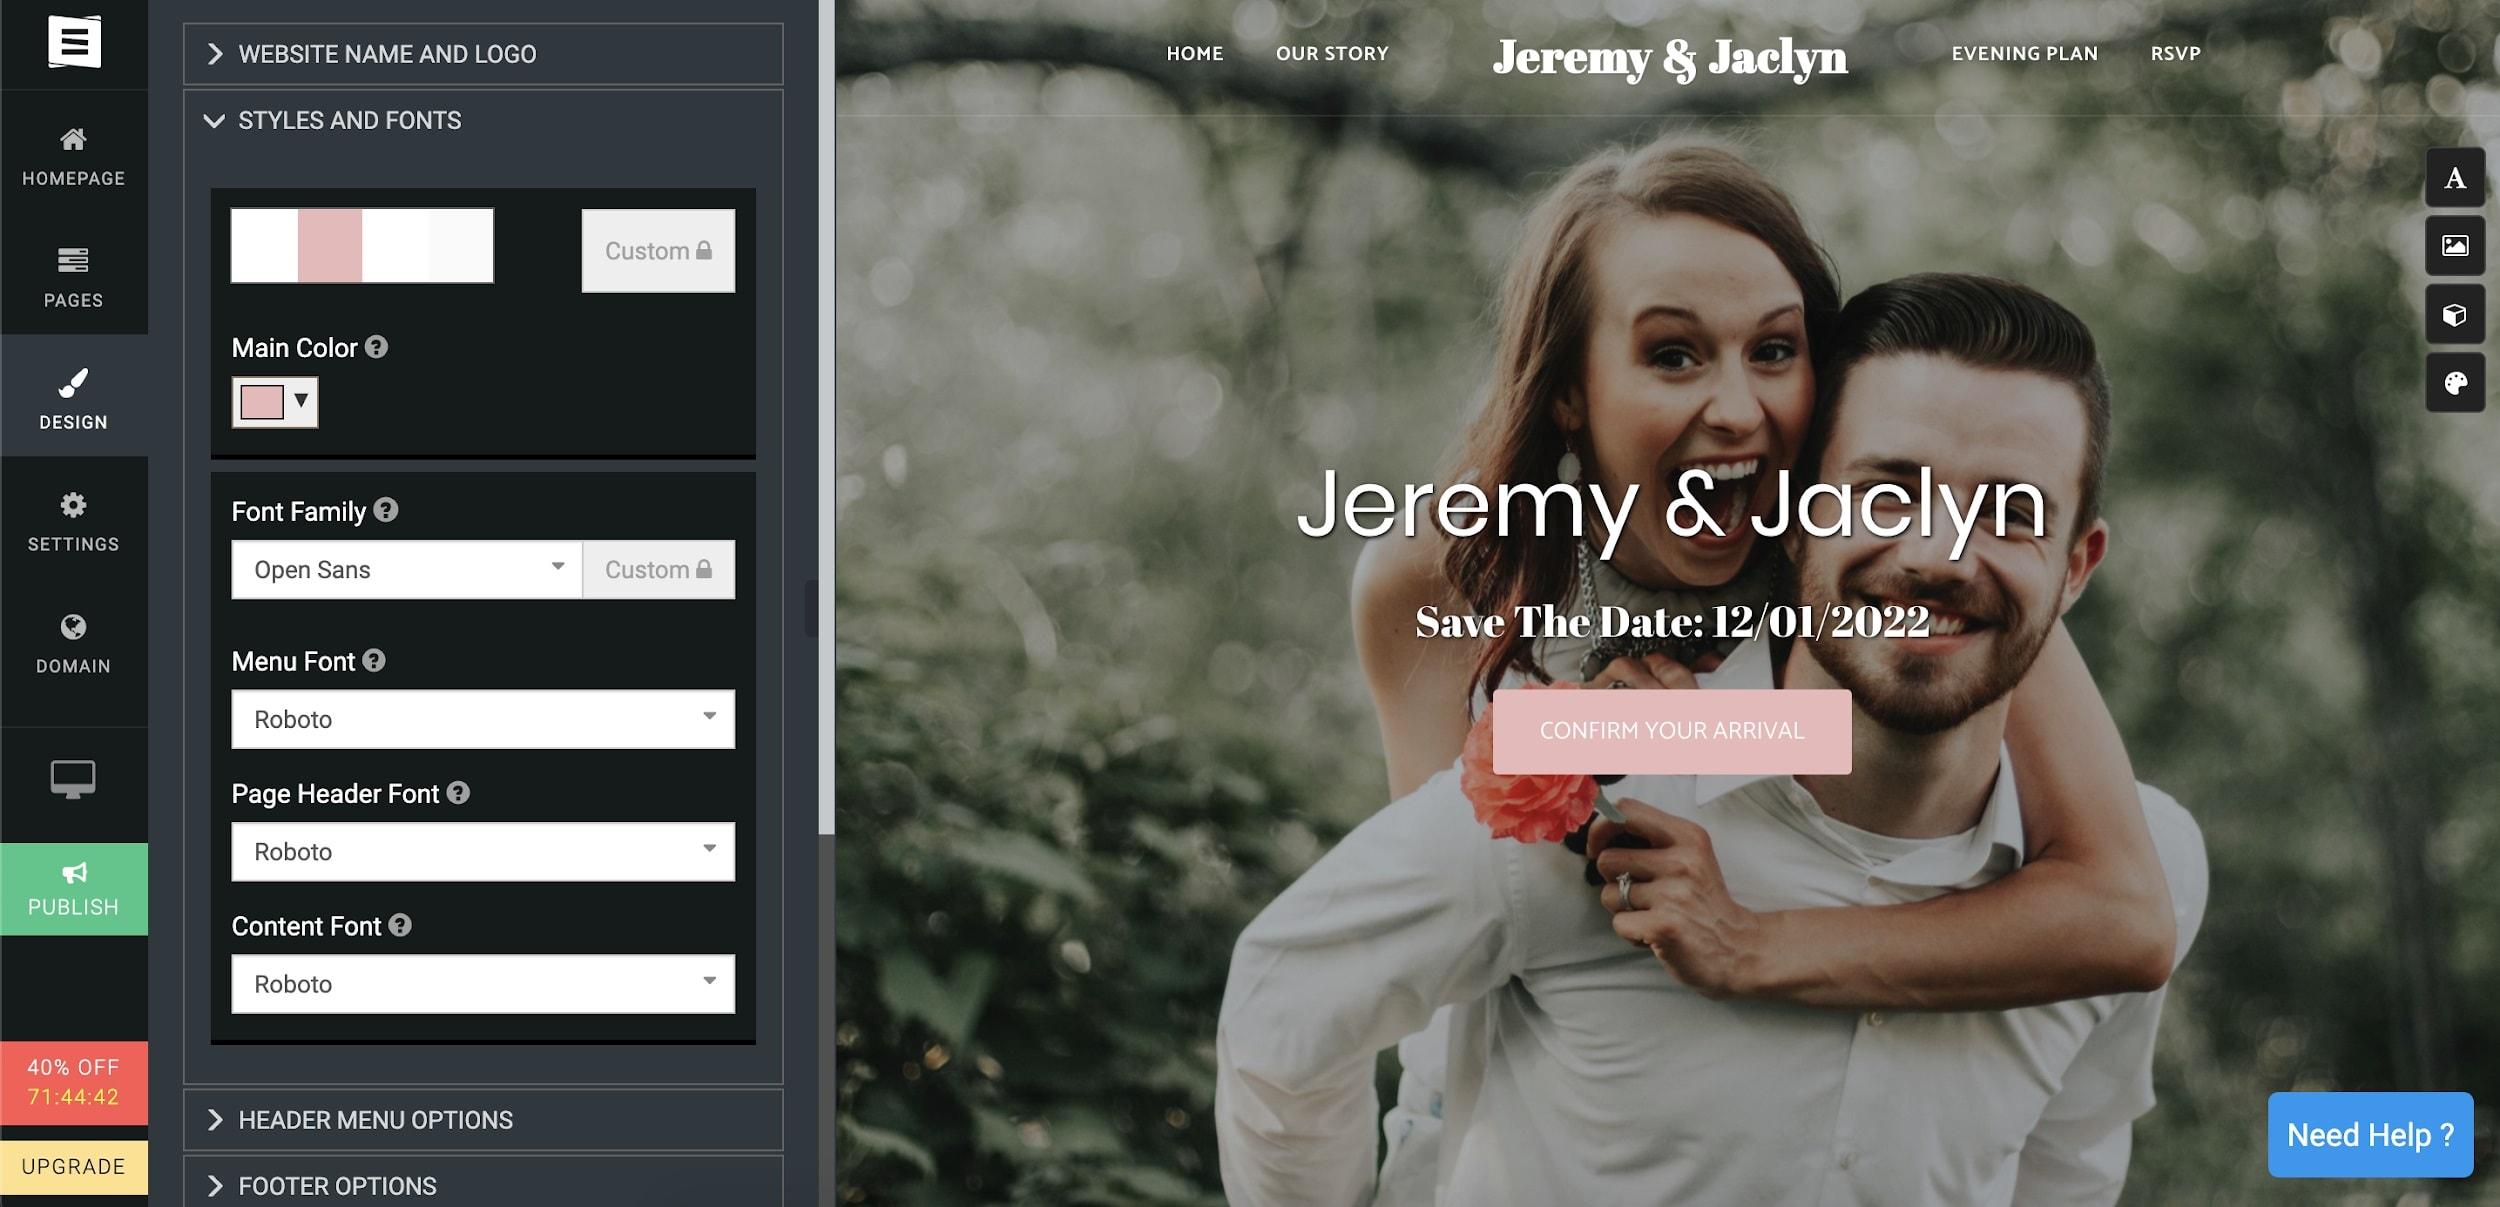 Site123 editor Jeremy & Jaclyn template